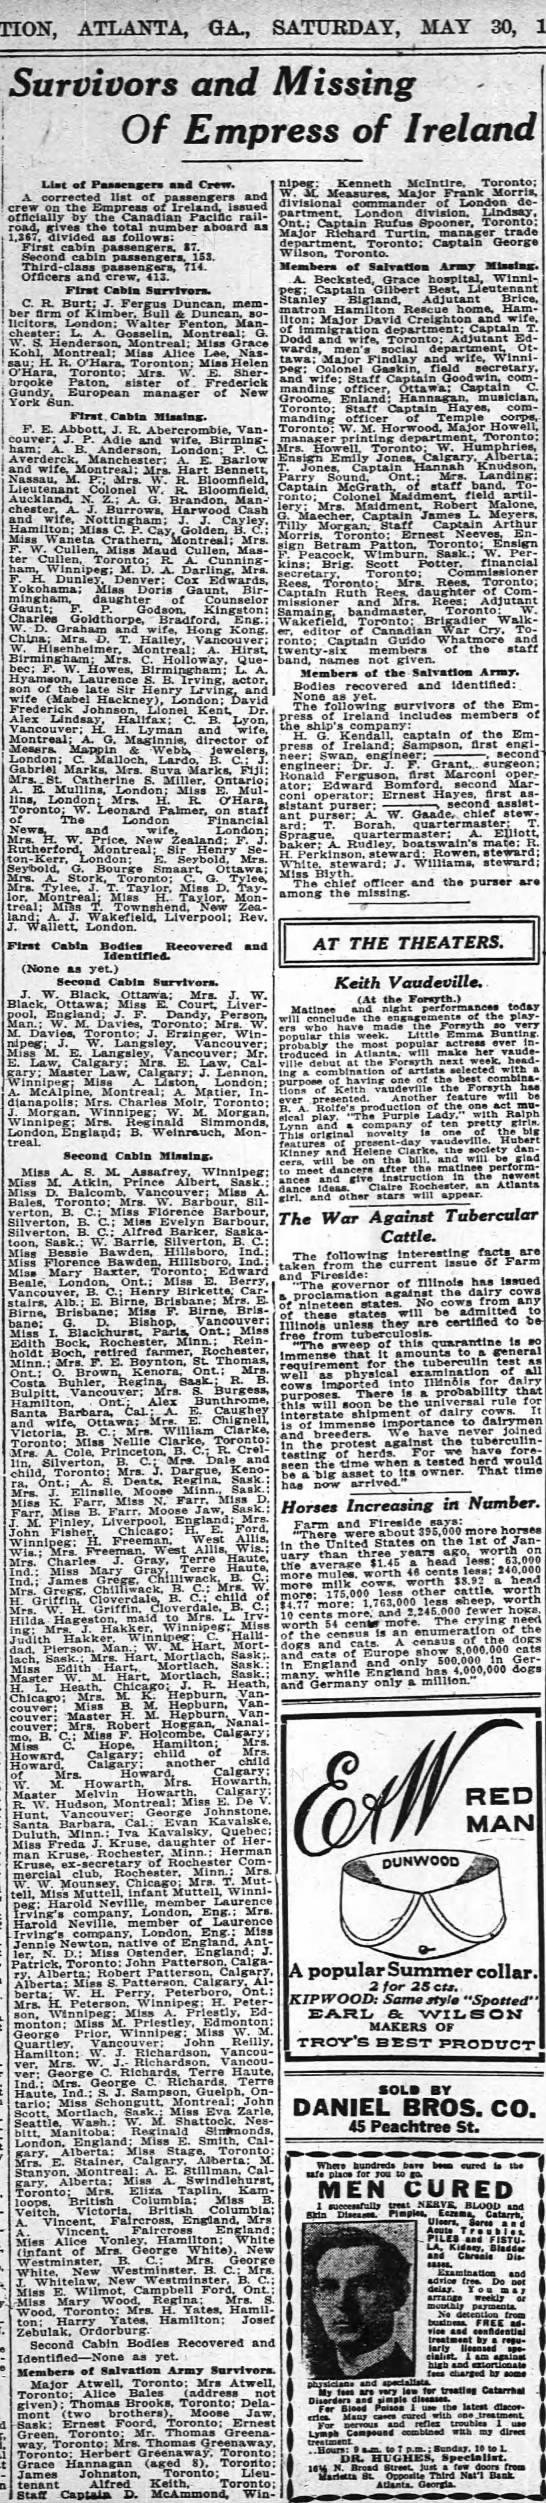 1914-05-30 FARR MISS N, MISS D, MISS B - ATLANTA GA. SATURDAY MAY so Survivors and...